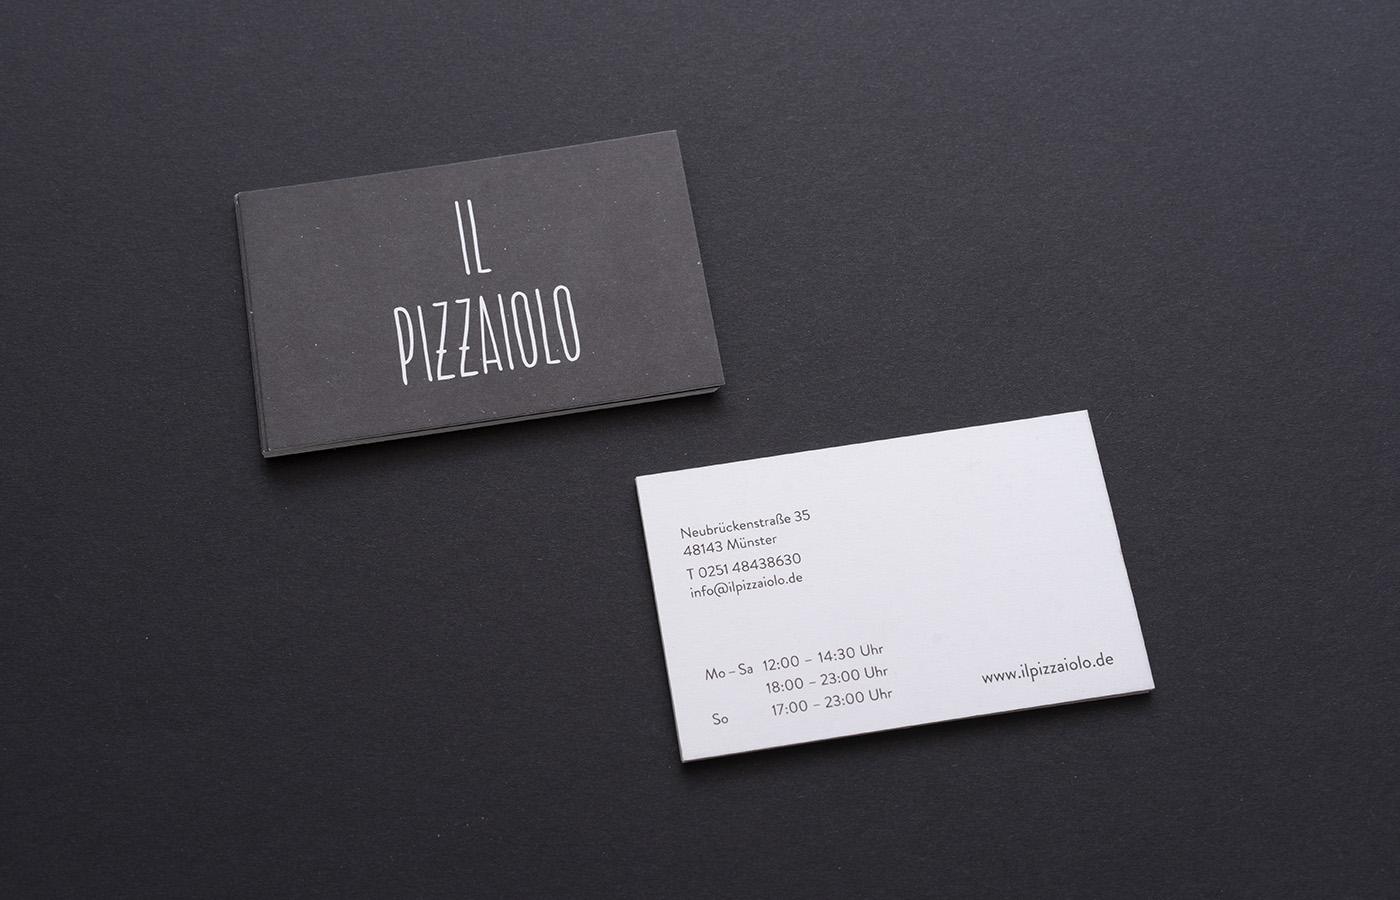 il_pizzaiolo_1.jpg